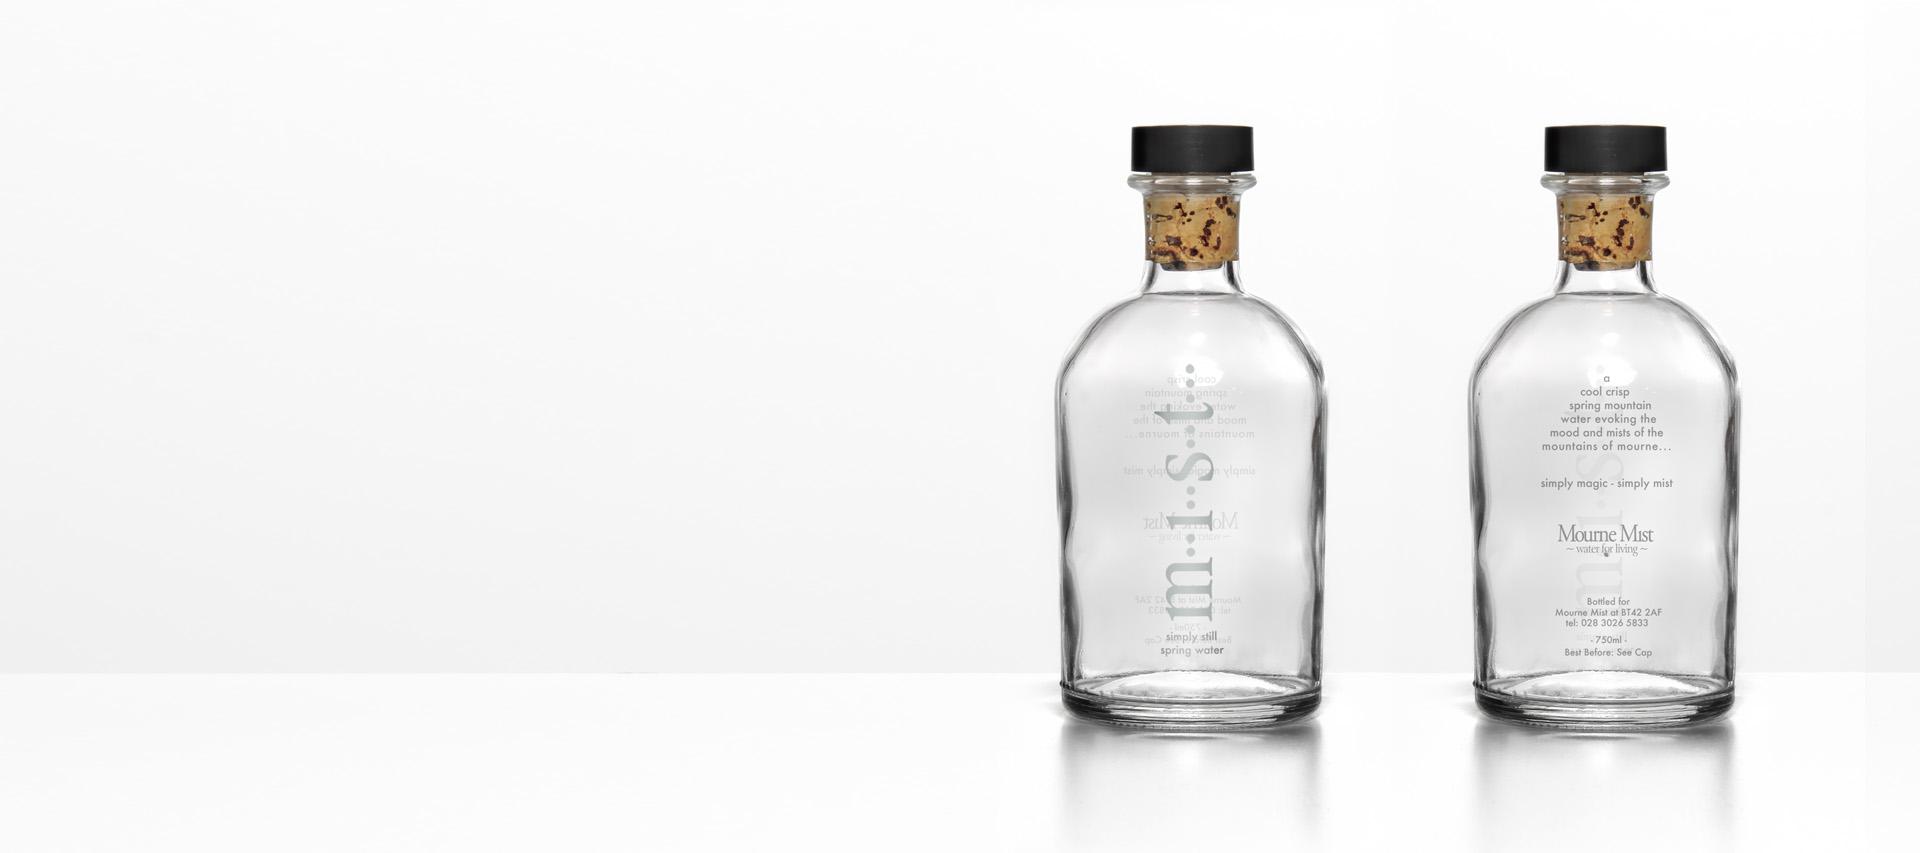 Packaging design Banbridge